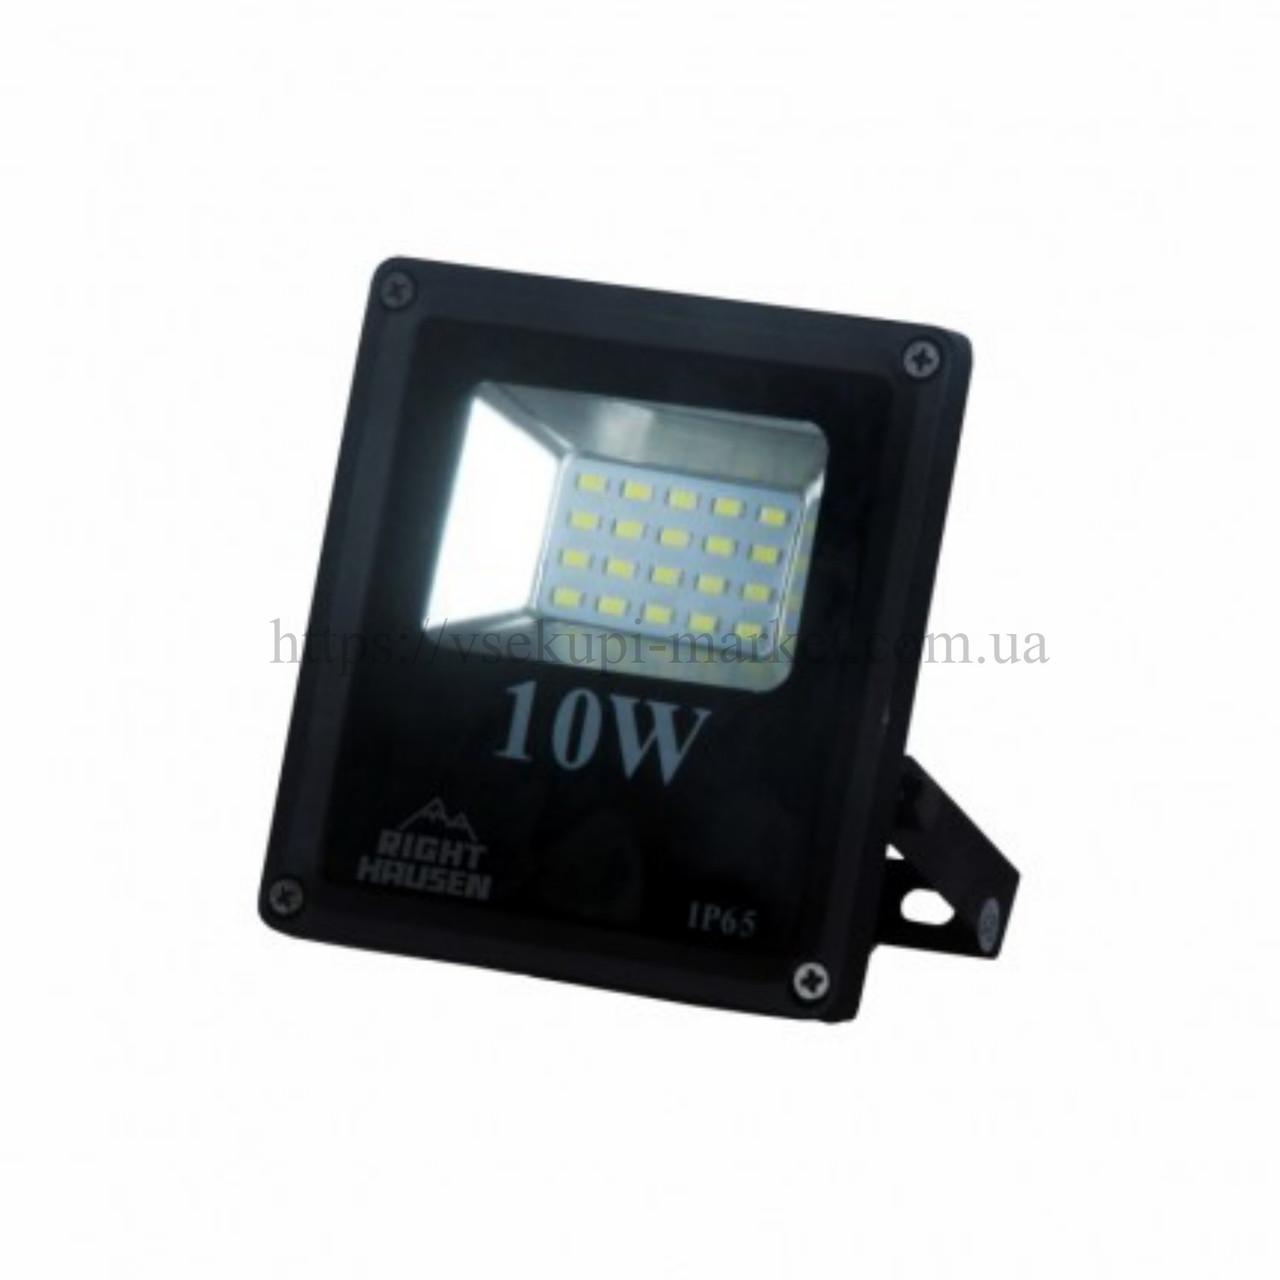 Прожектор RIGHT HAUSEN STANDARD LED 10W 6500K IP65 черный HN-191212N